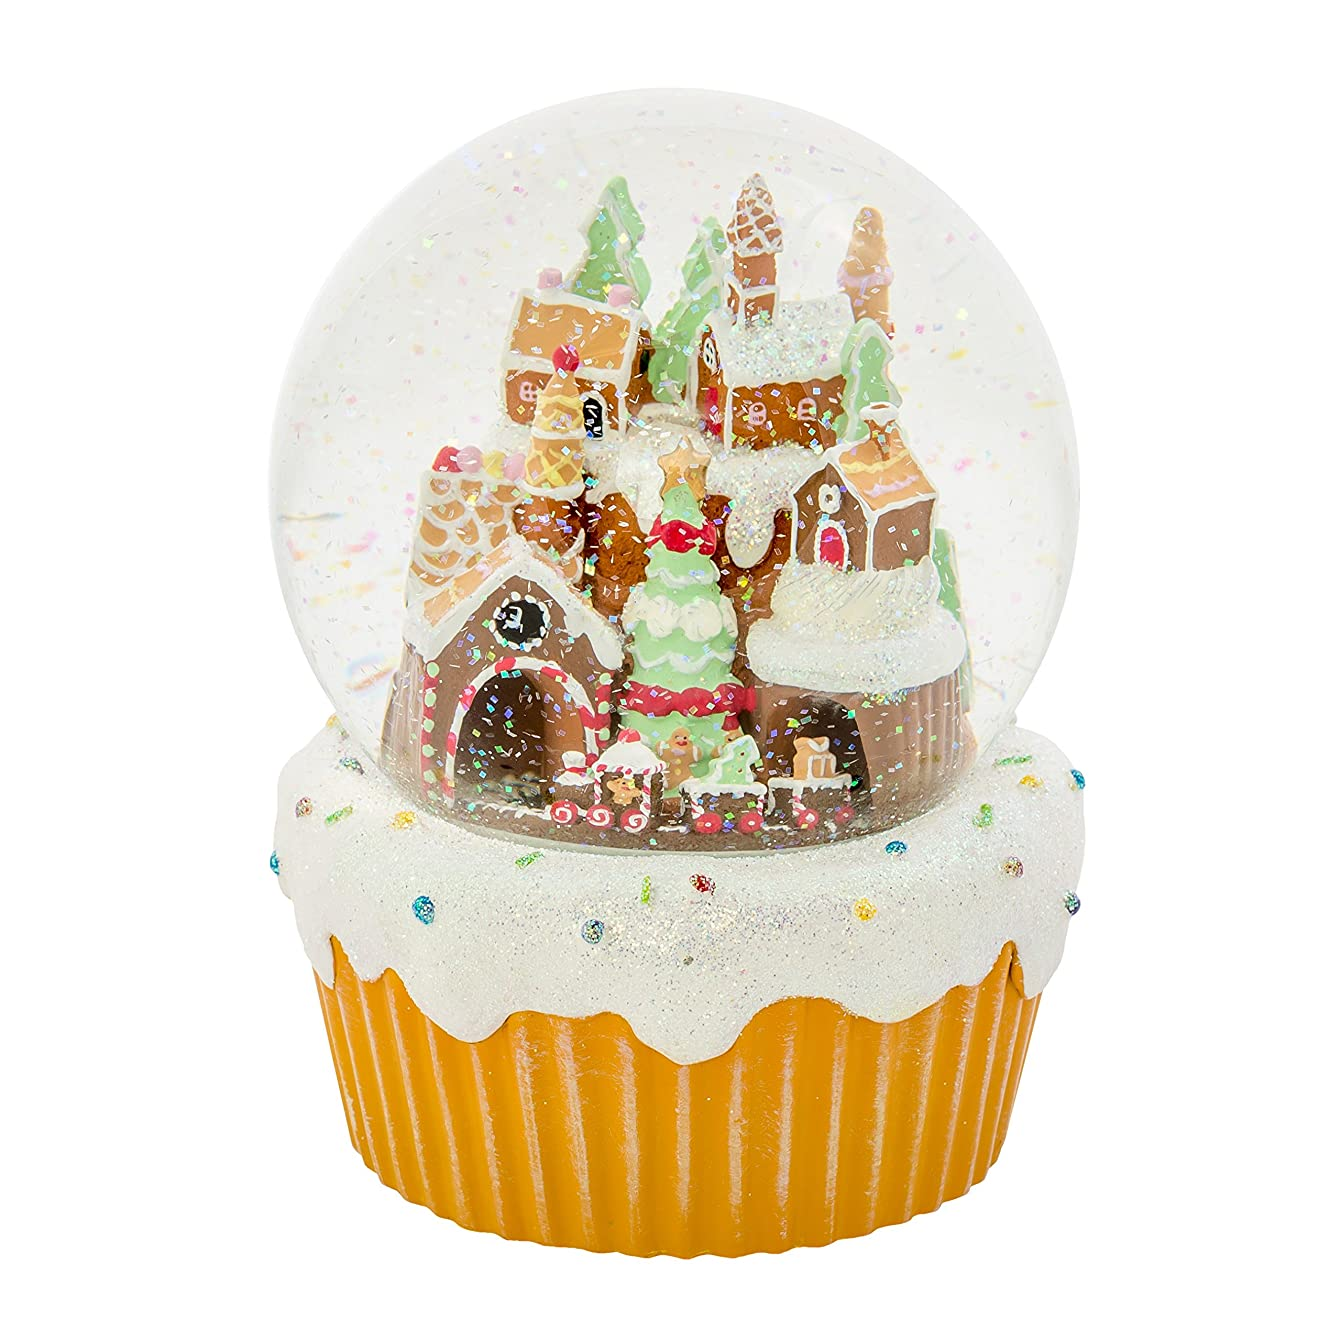 Roman Gingerbread Village Train 120MM Musical Glitterdome Water Globe Plays We Wish You a Merry